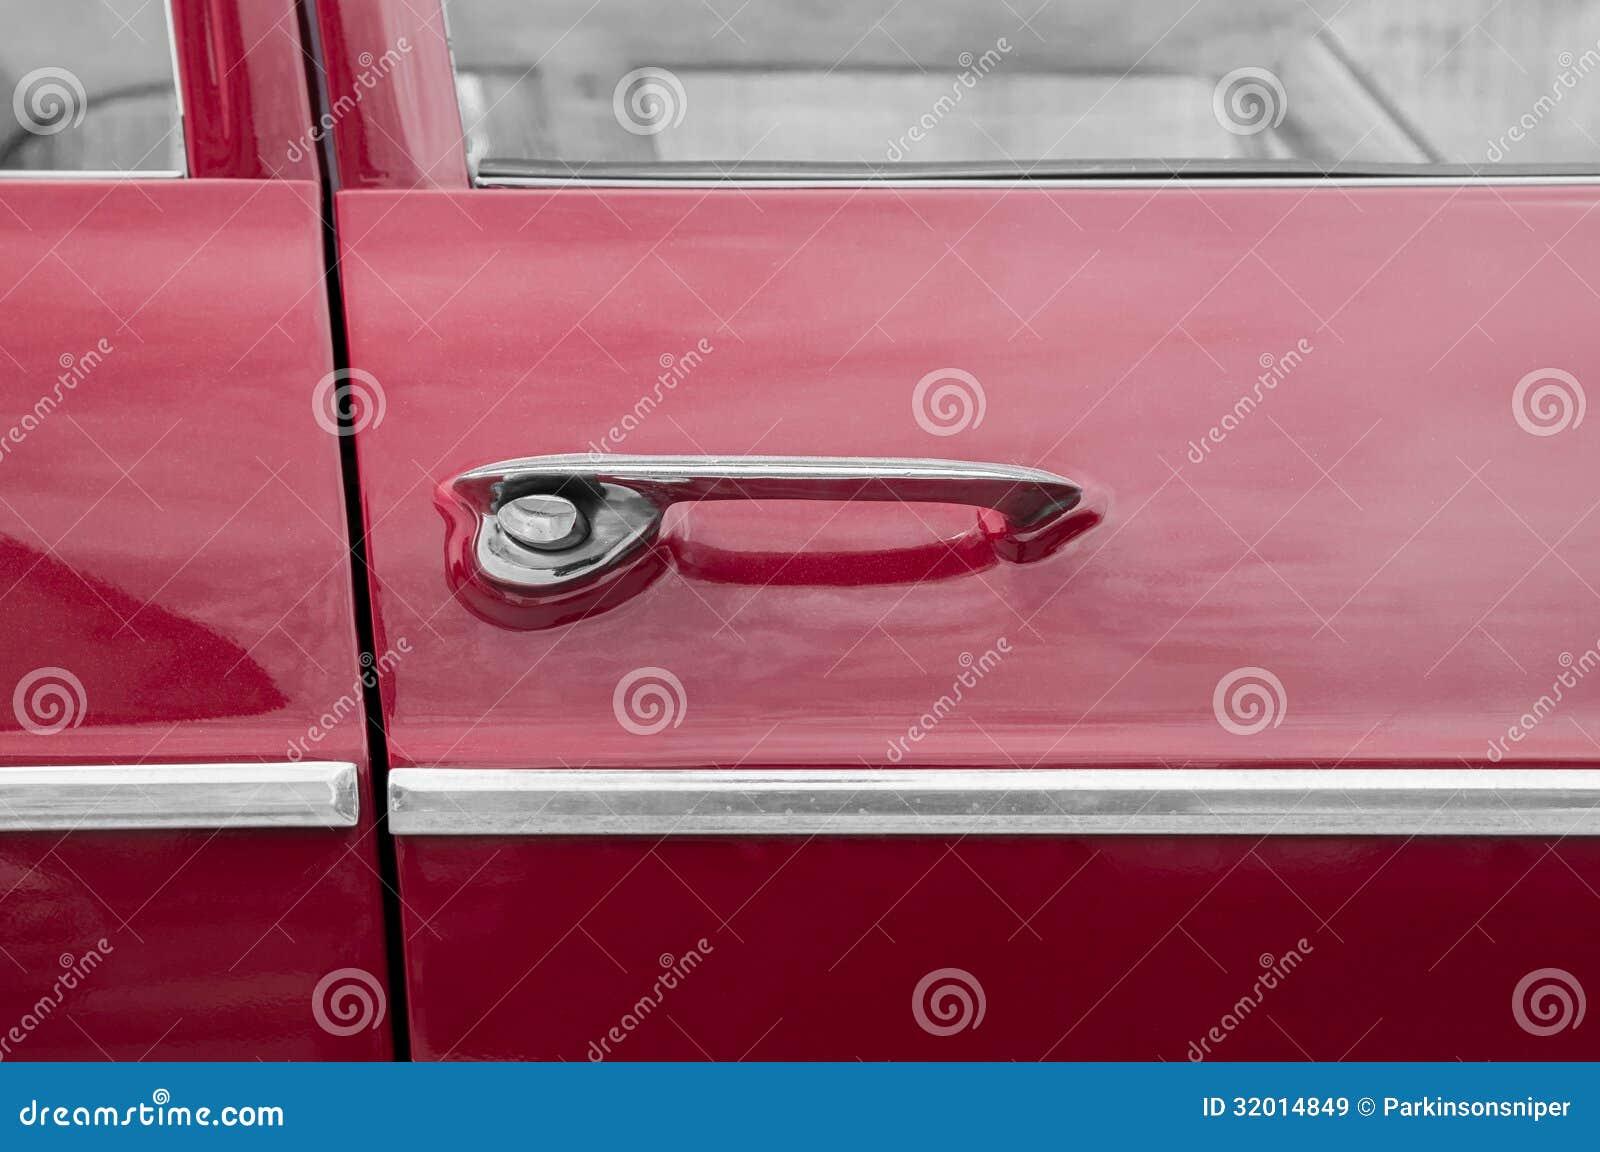 car door handle royalty free stock images image 32014849. Black Bedroom Furniture Sets. Home Design Ideas